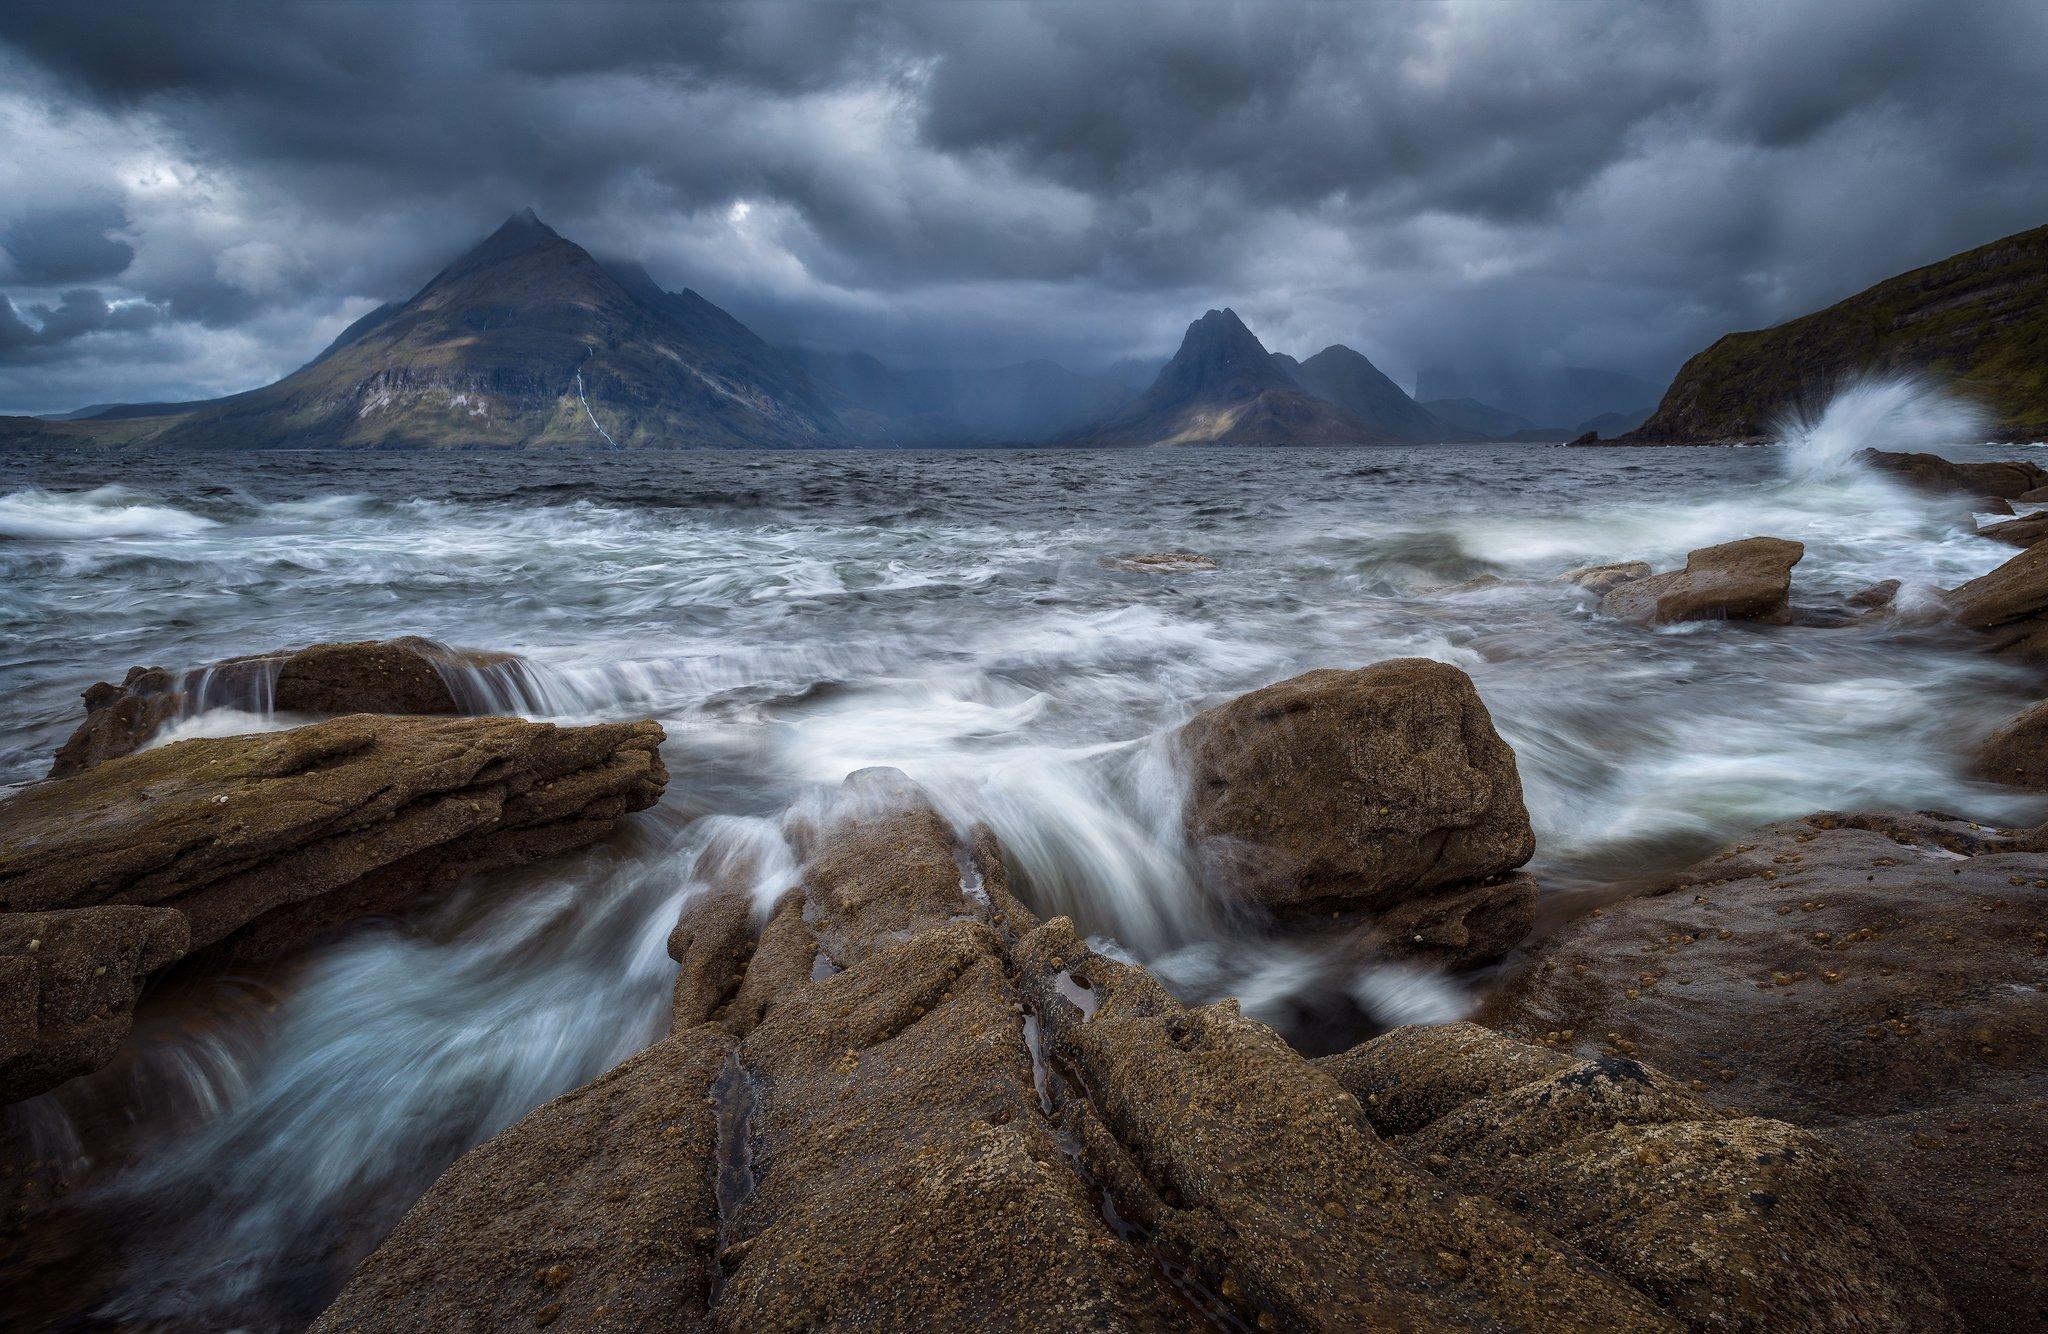 elgol scotland isle of skye mountains sky clouds seascape, Maciej Warchoł